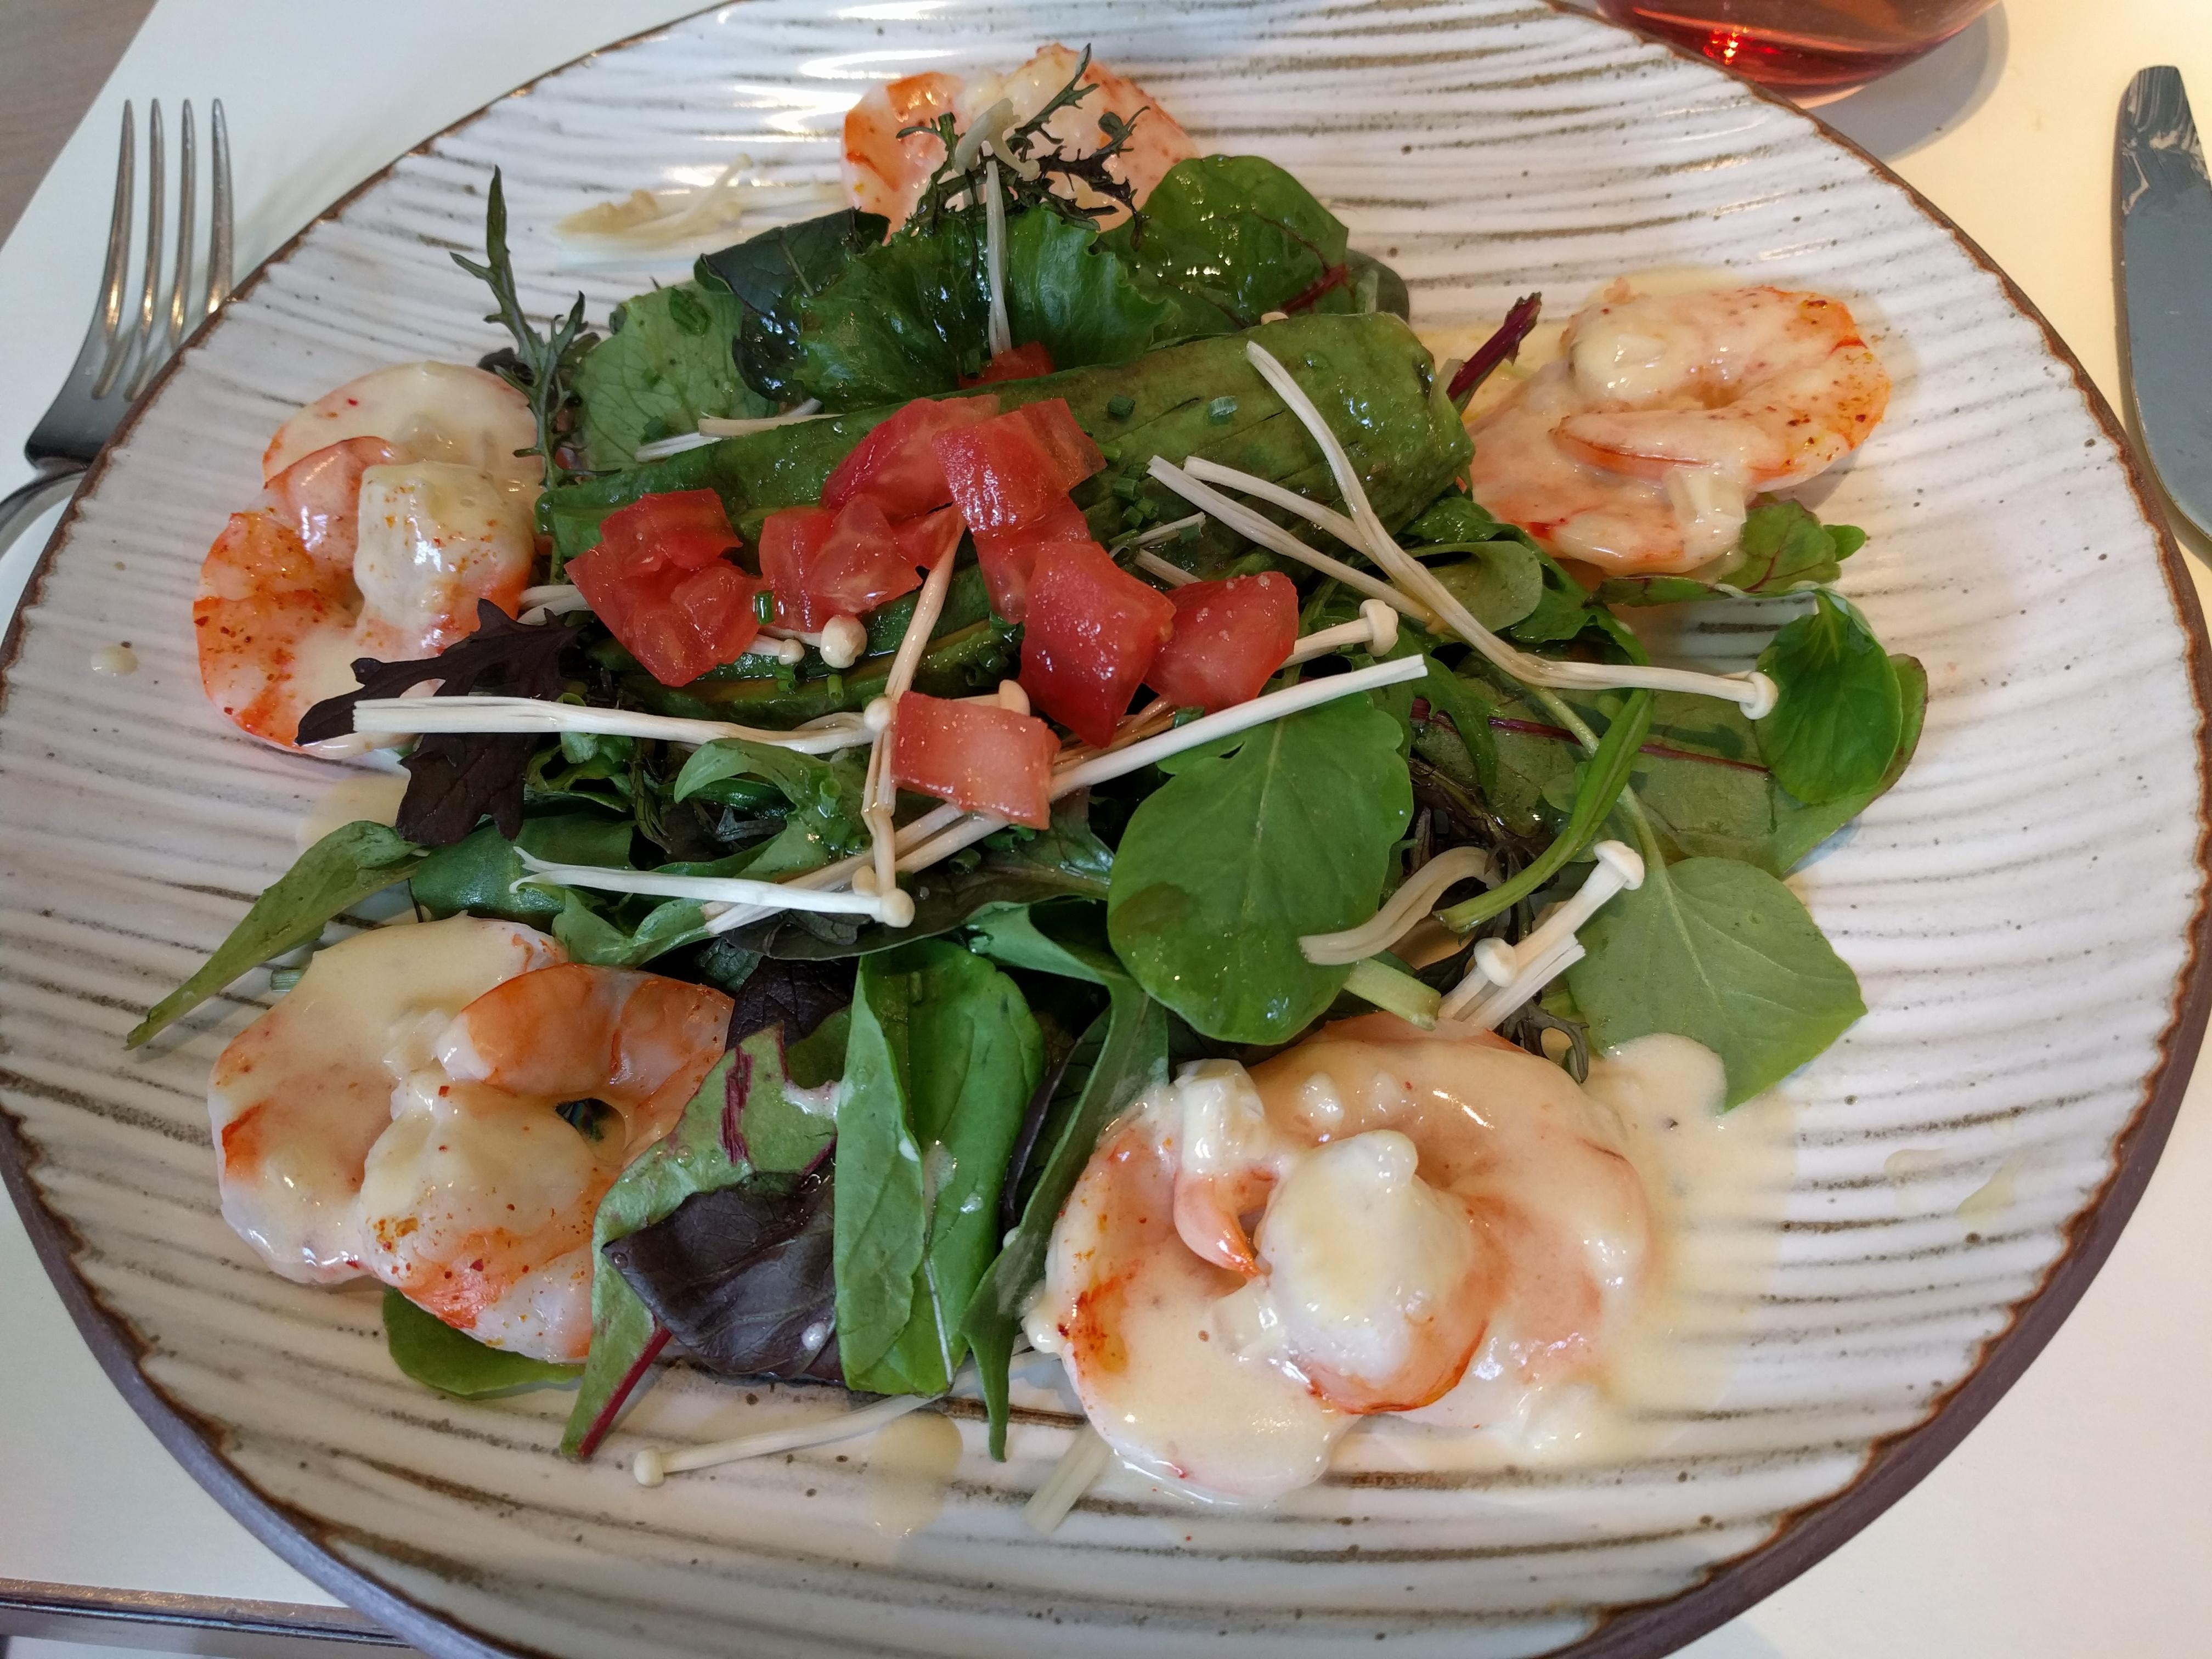 My shrimp salad